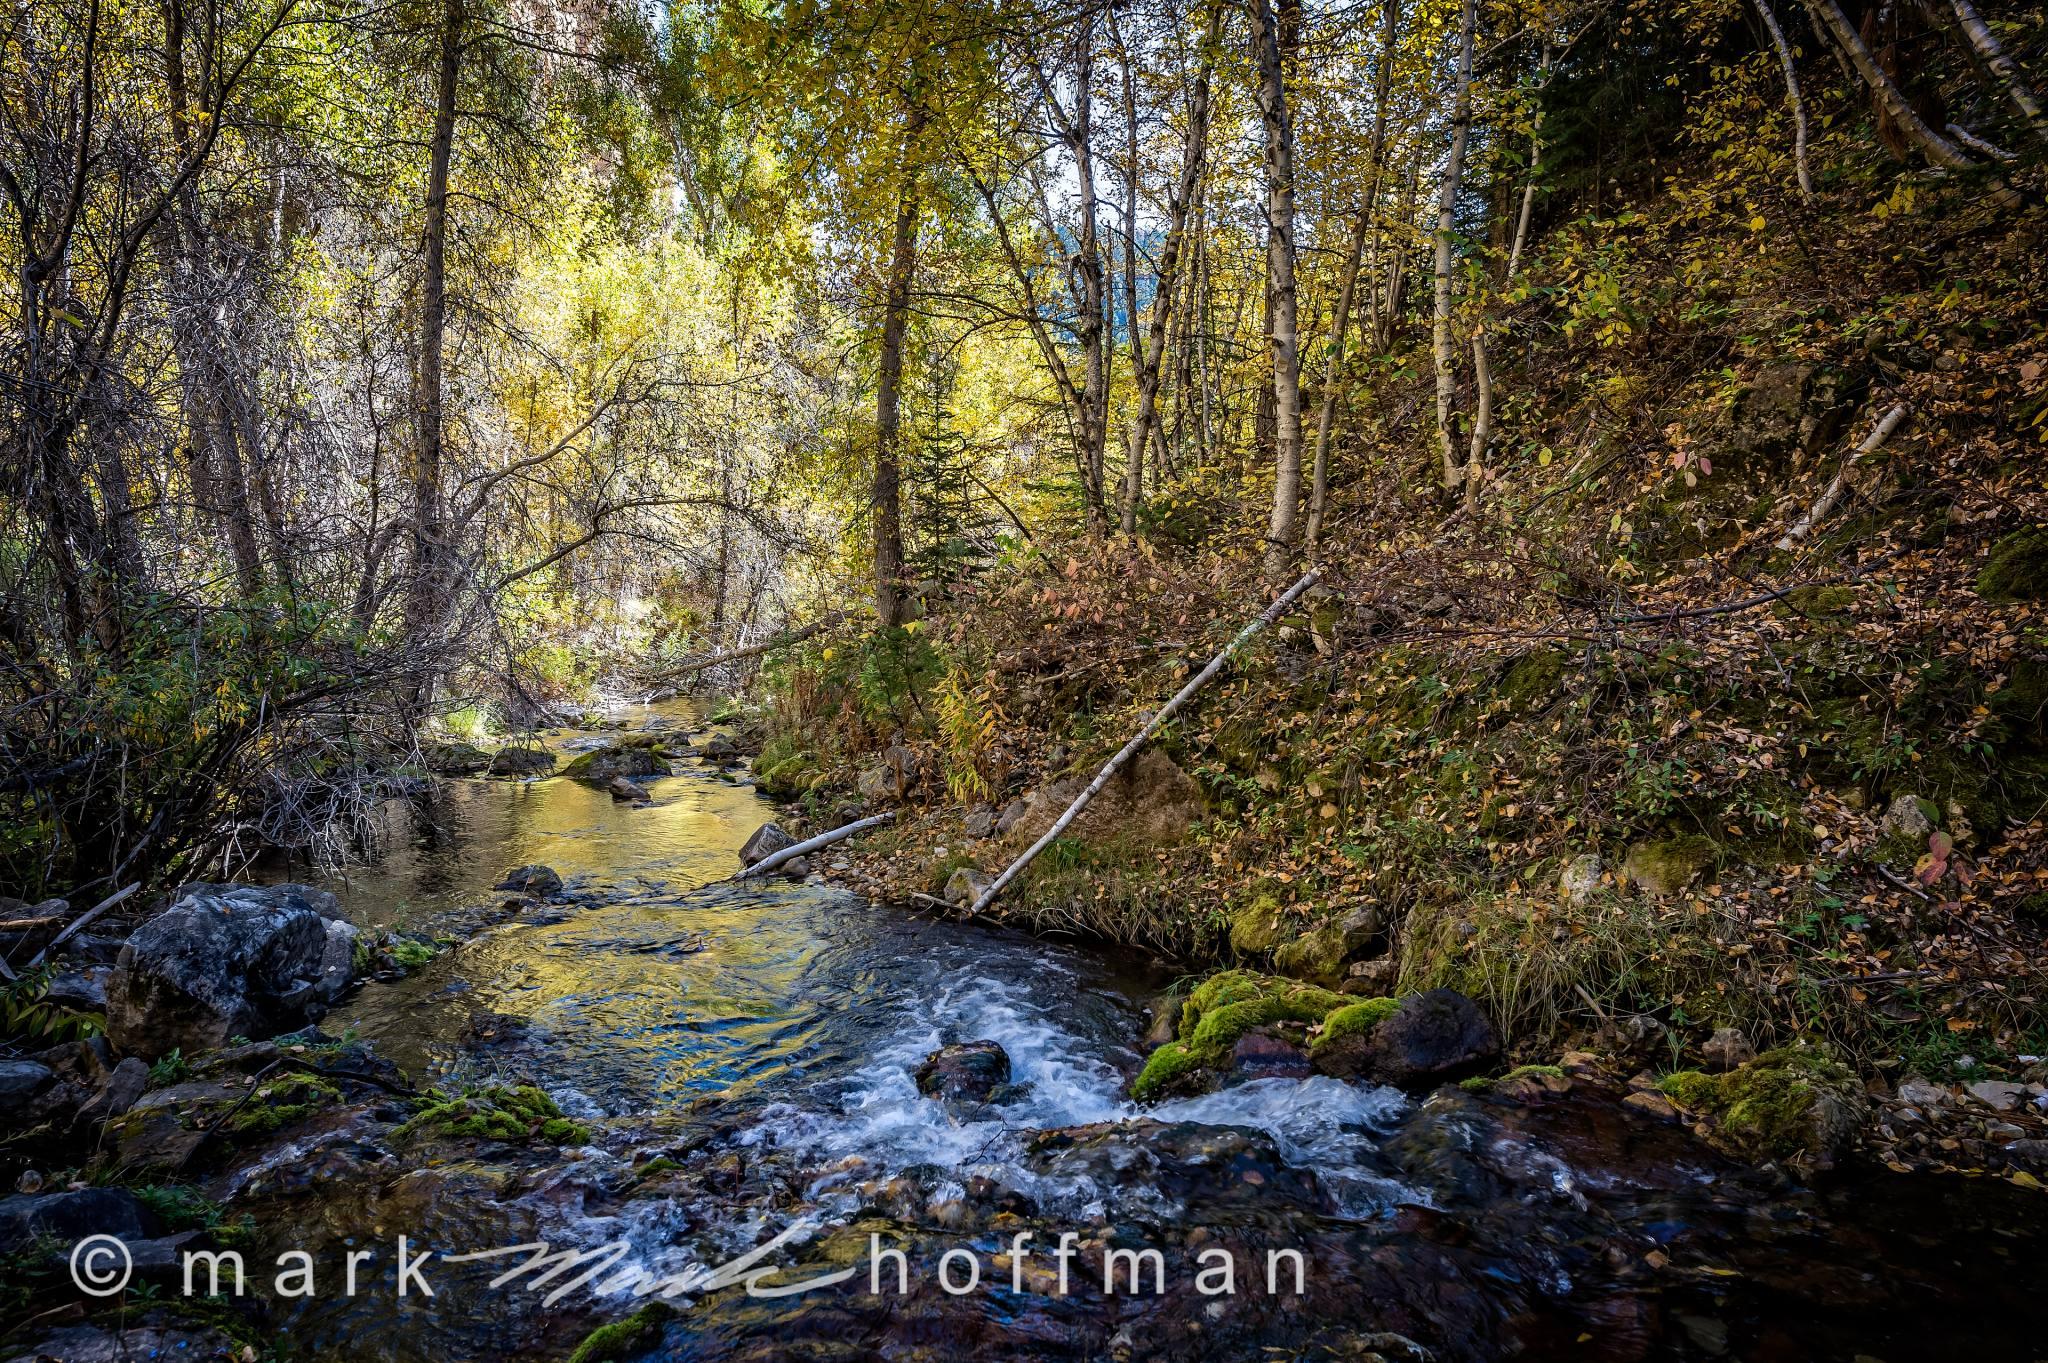 Mark_Hoffman_photophart_20150925_0031-HDR_PFX_cap1_var1.jpg